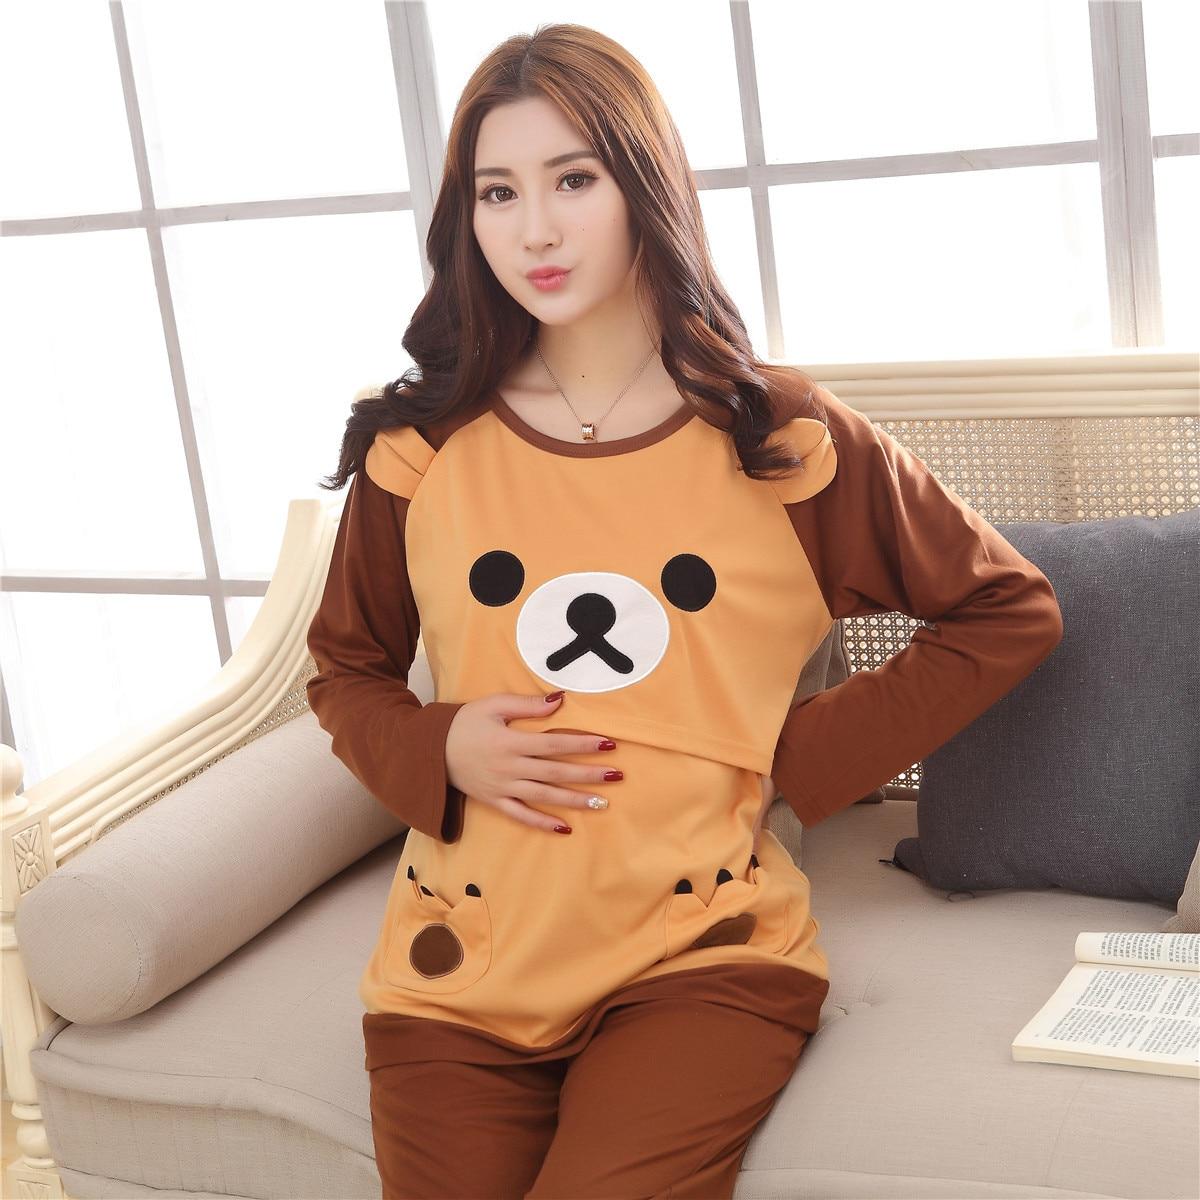 Spring Autumn high-grade Maternity Sleepwear Lounge Sets Nursing Tops + Pants Breast Feeding Pajamas Clothes For Pregnant Women